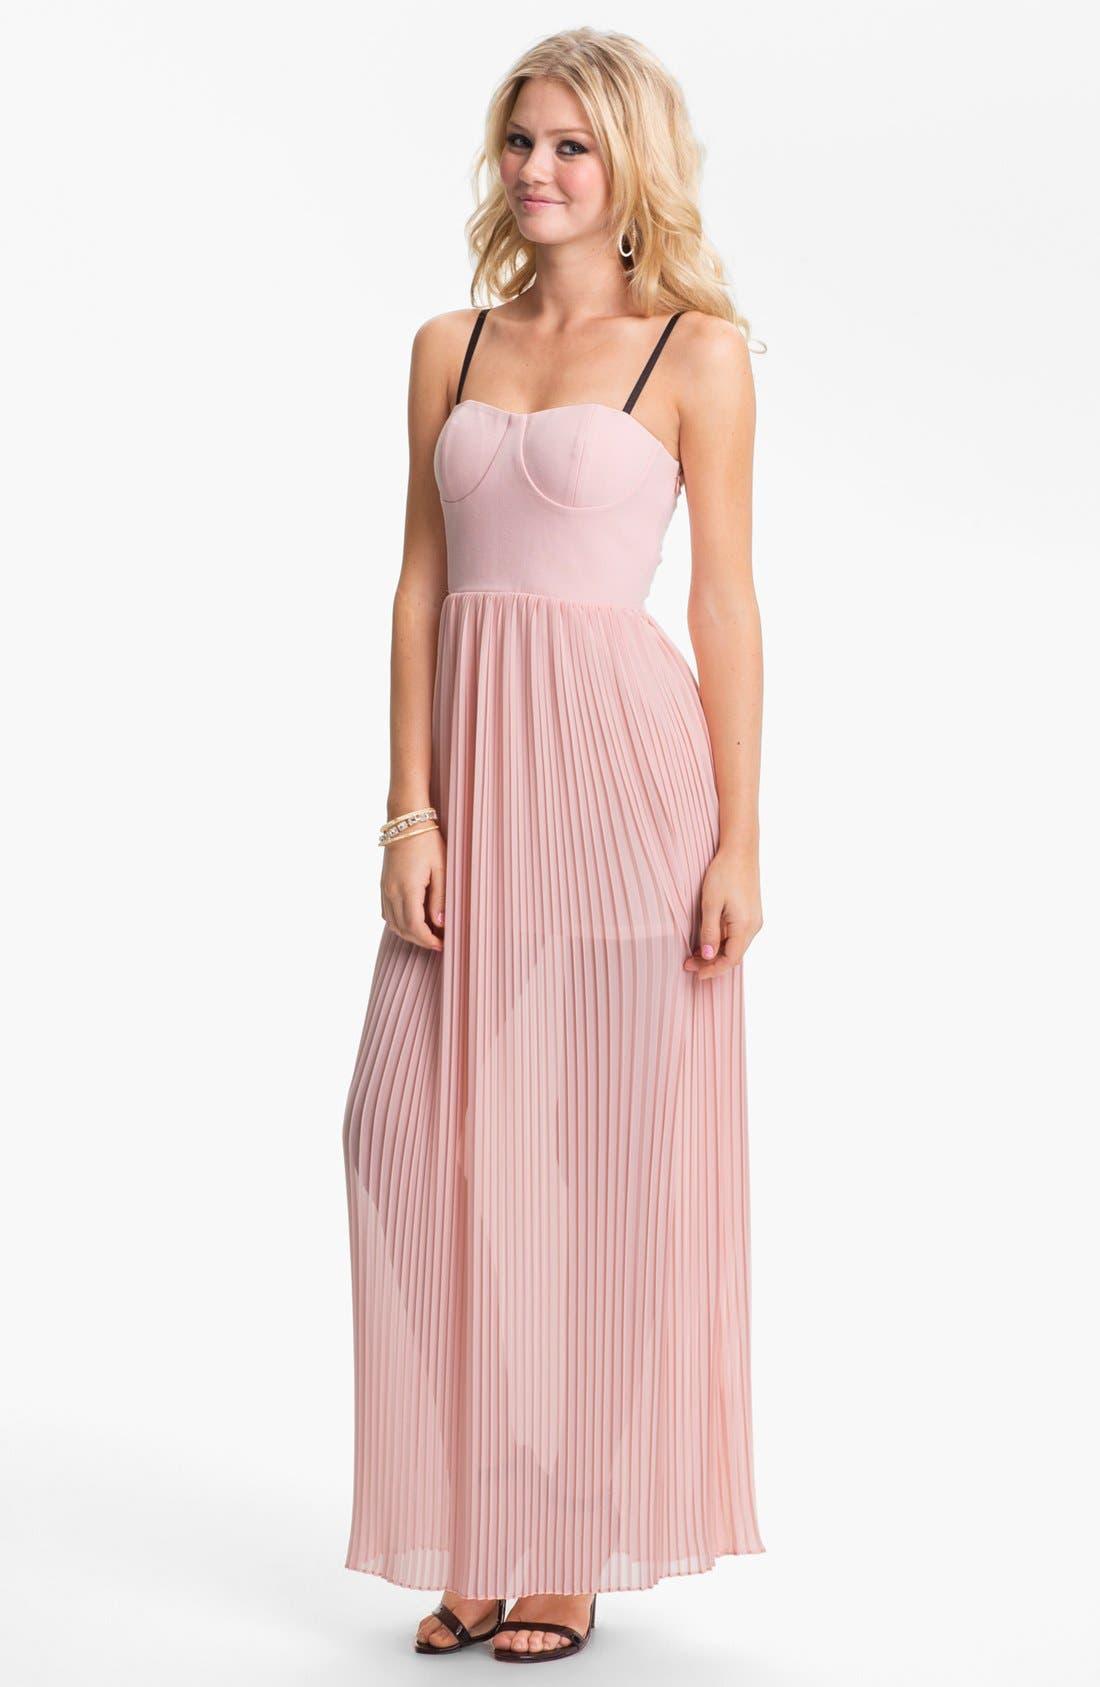 Main Image - BLAQUE LABEL Pleated Chiffon Maxi Dress